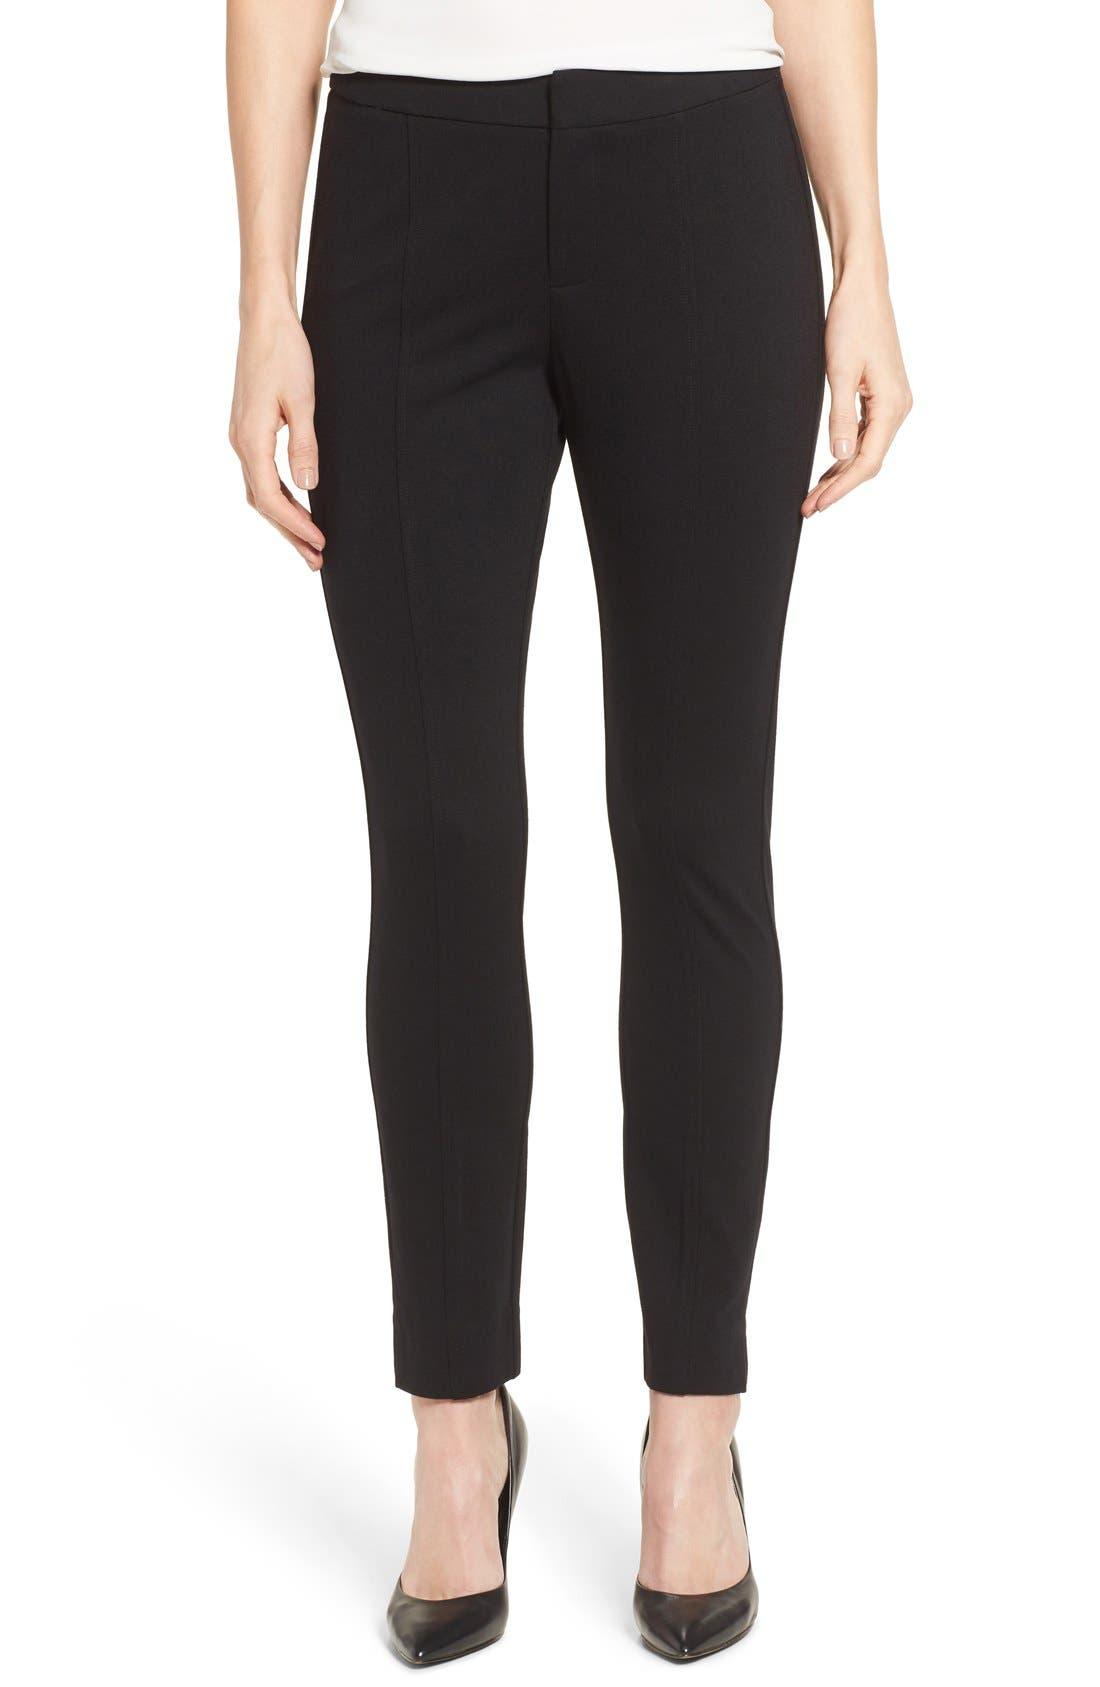 Main Image - NYDJ 'Betty' Stretch Ankle Pants (Regular & Petite)